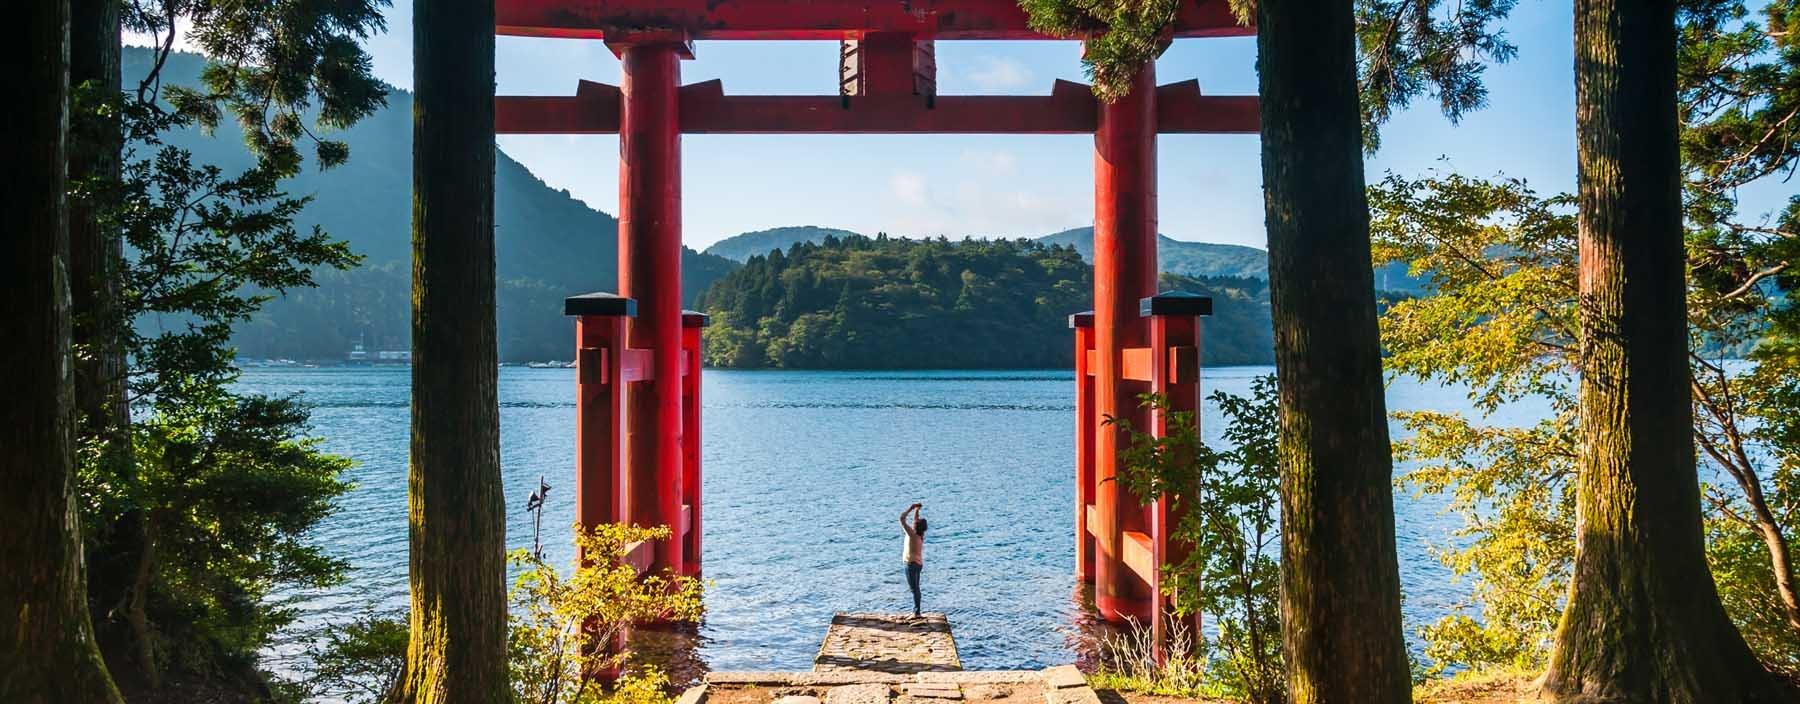 jp, mt fuji, hakone, torii gate.jpg